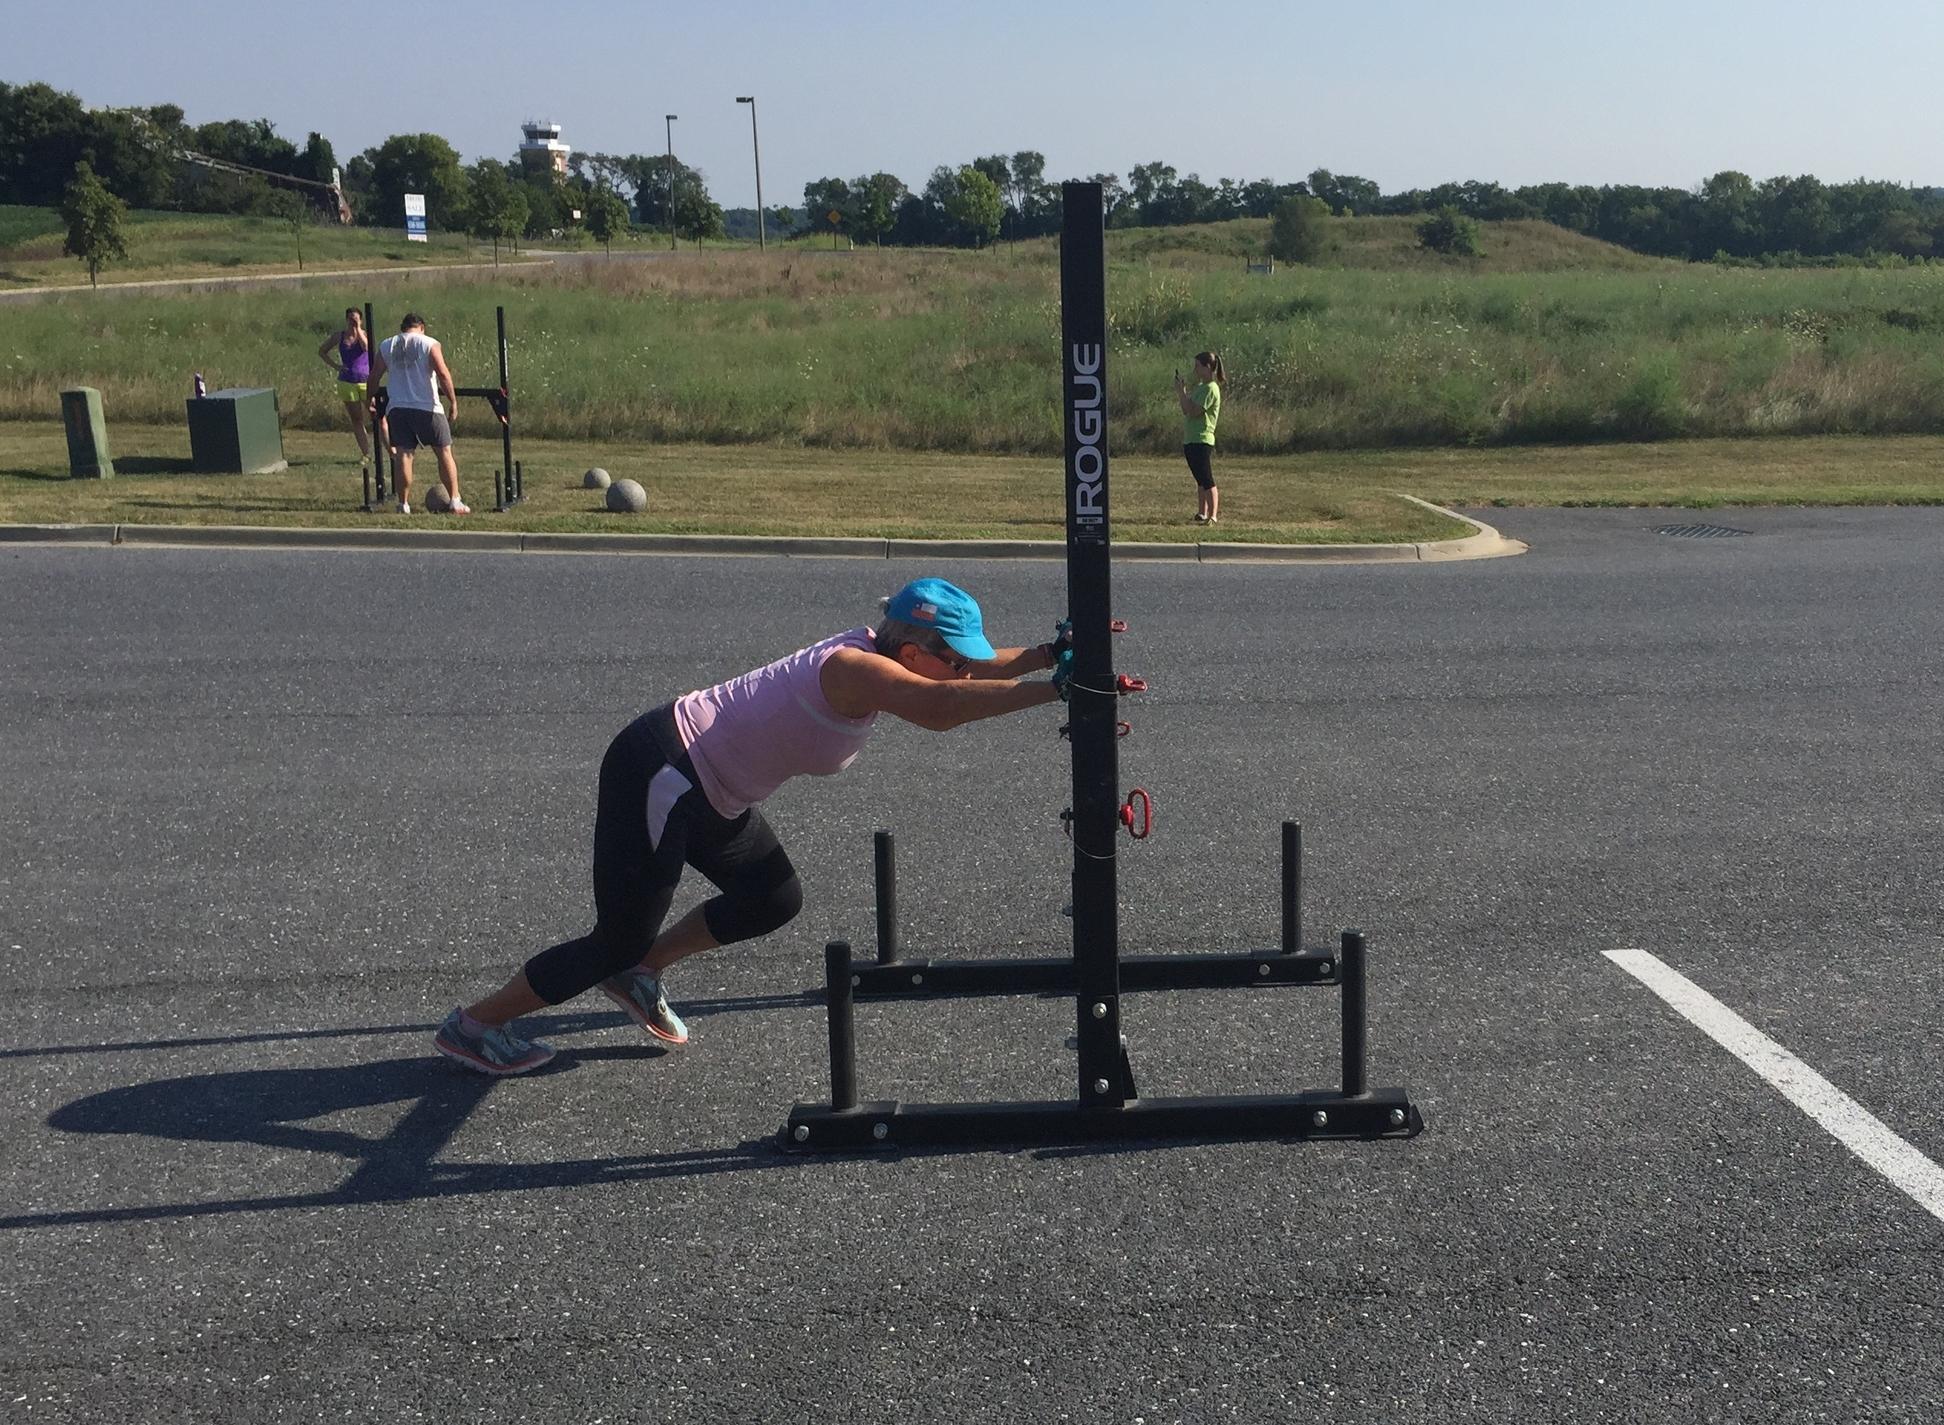 Margaret, pushing the prowler during a Strongman workout.